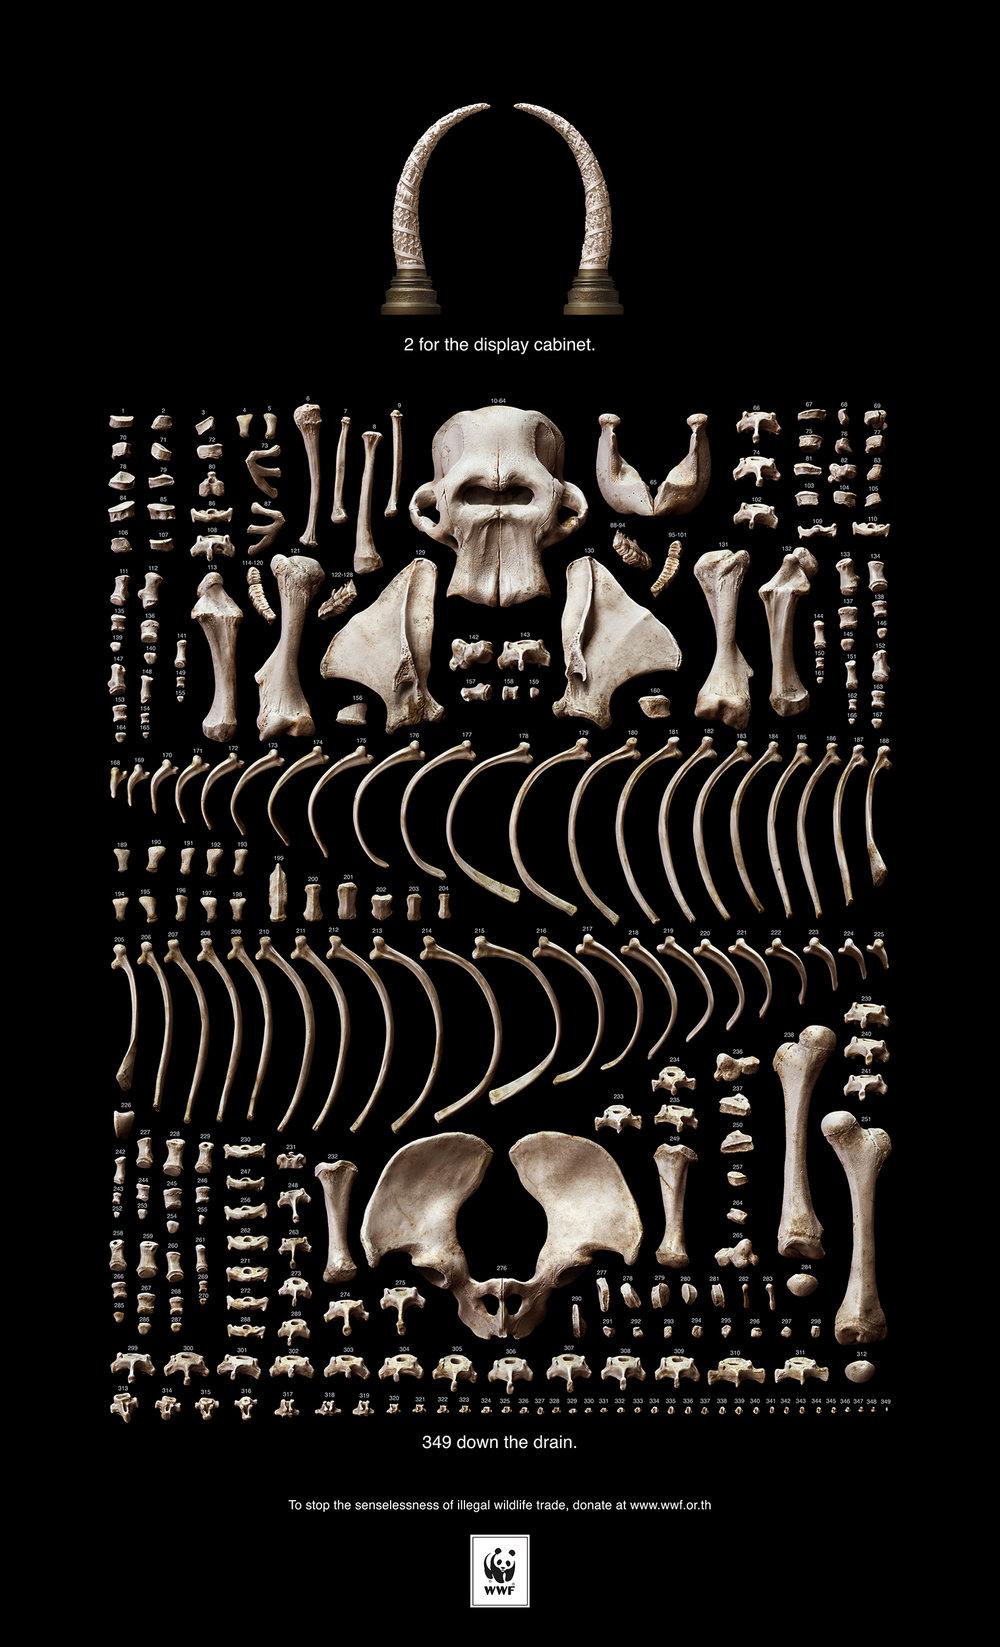 WWF_Elephant_Skeleton_Srgb.jpg